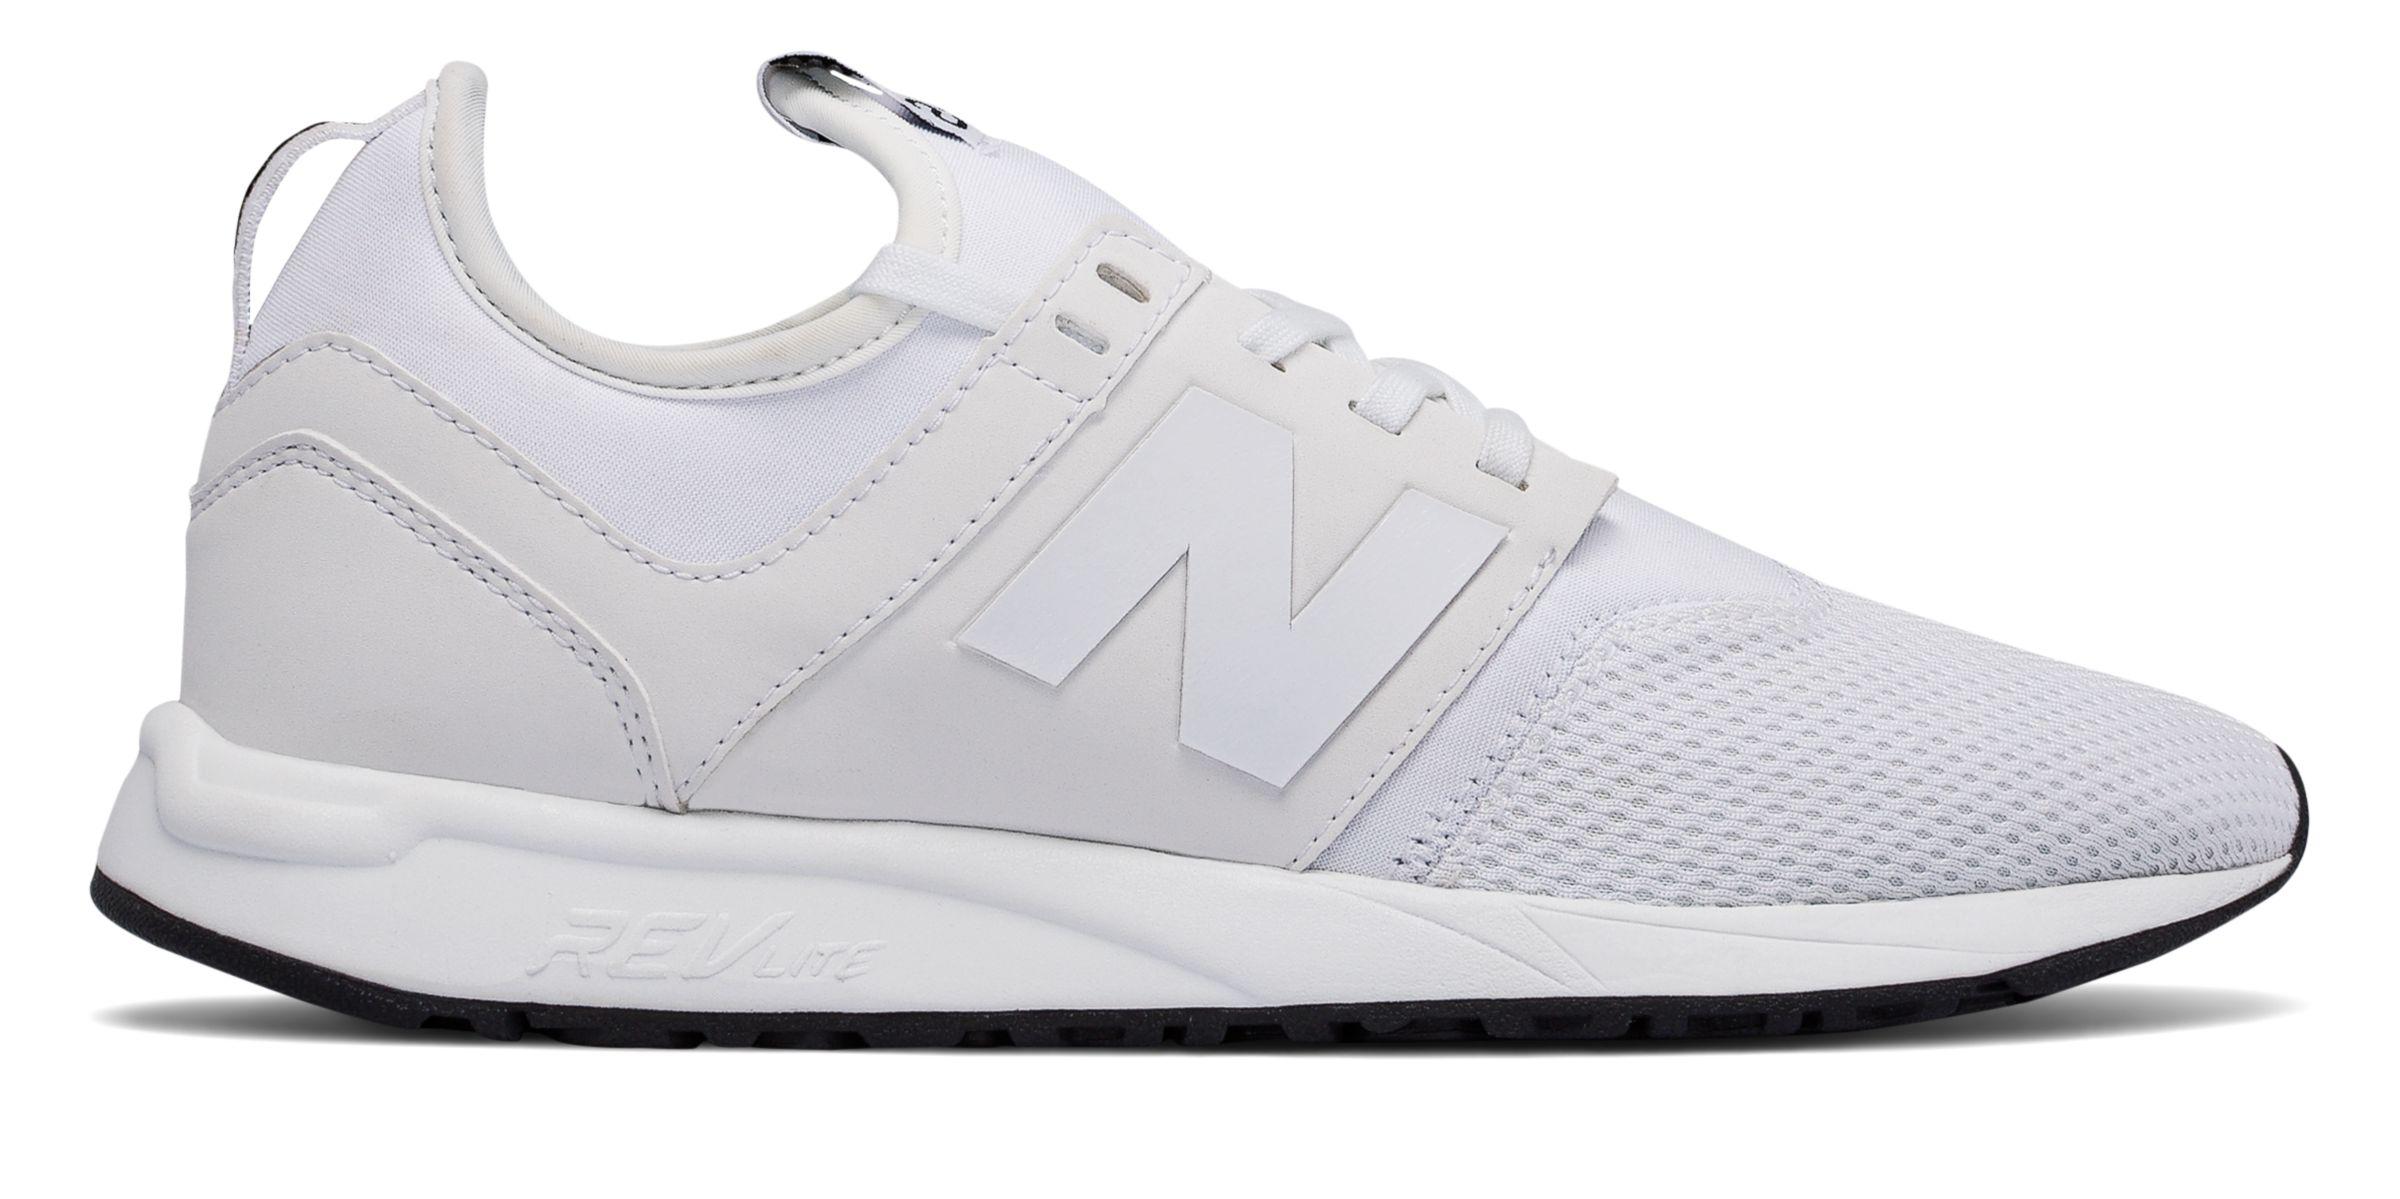 New Balance KL247 - KL247C4G - el Color Blanco - ES-Rozmiar: 37.5 fXlKDU